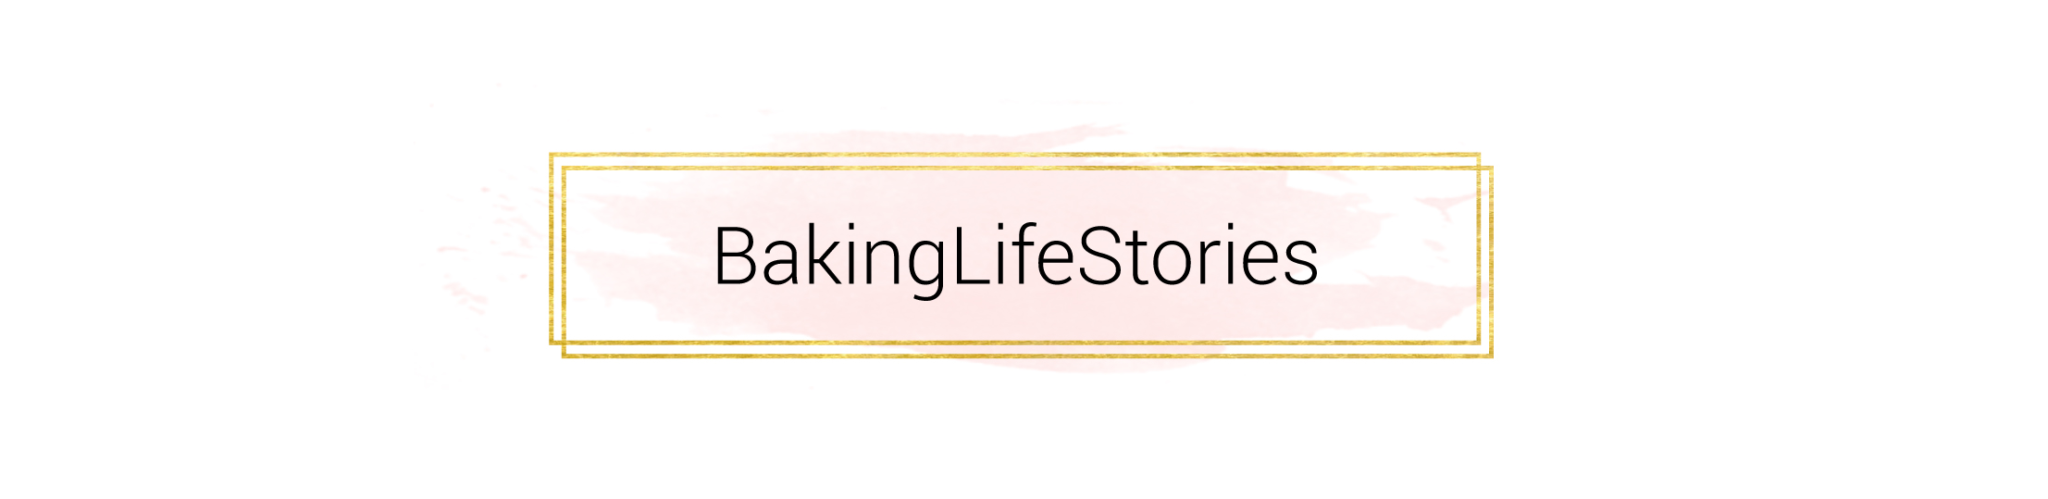 BakingLifeStories